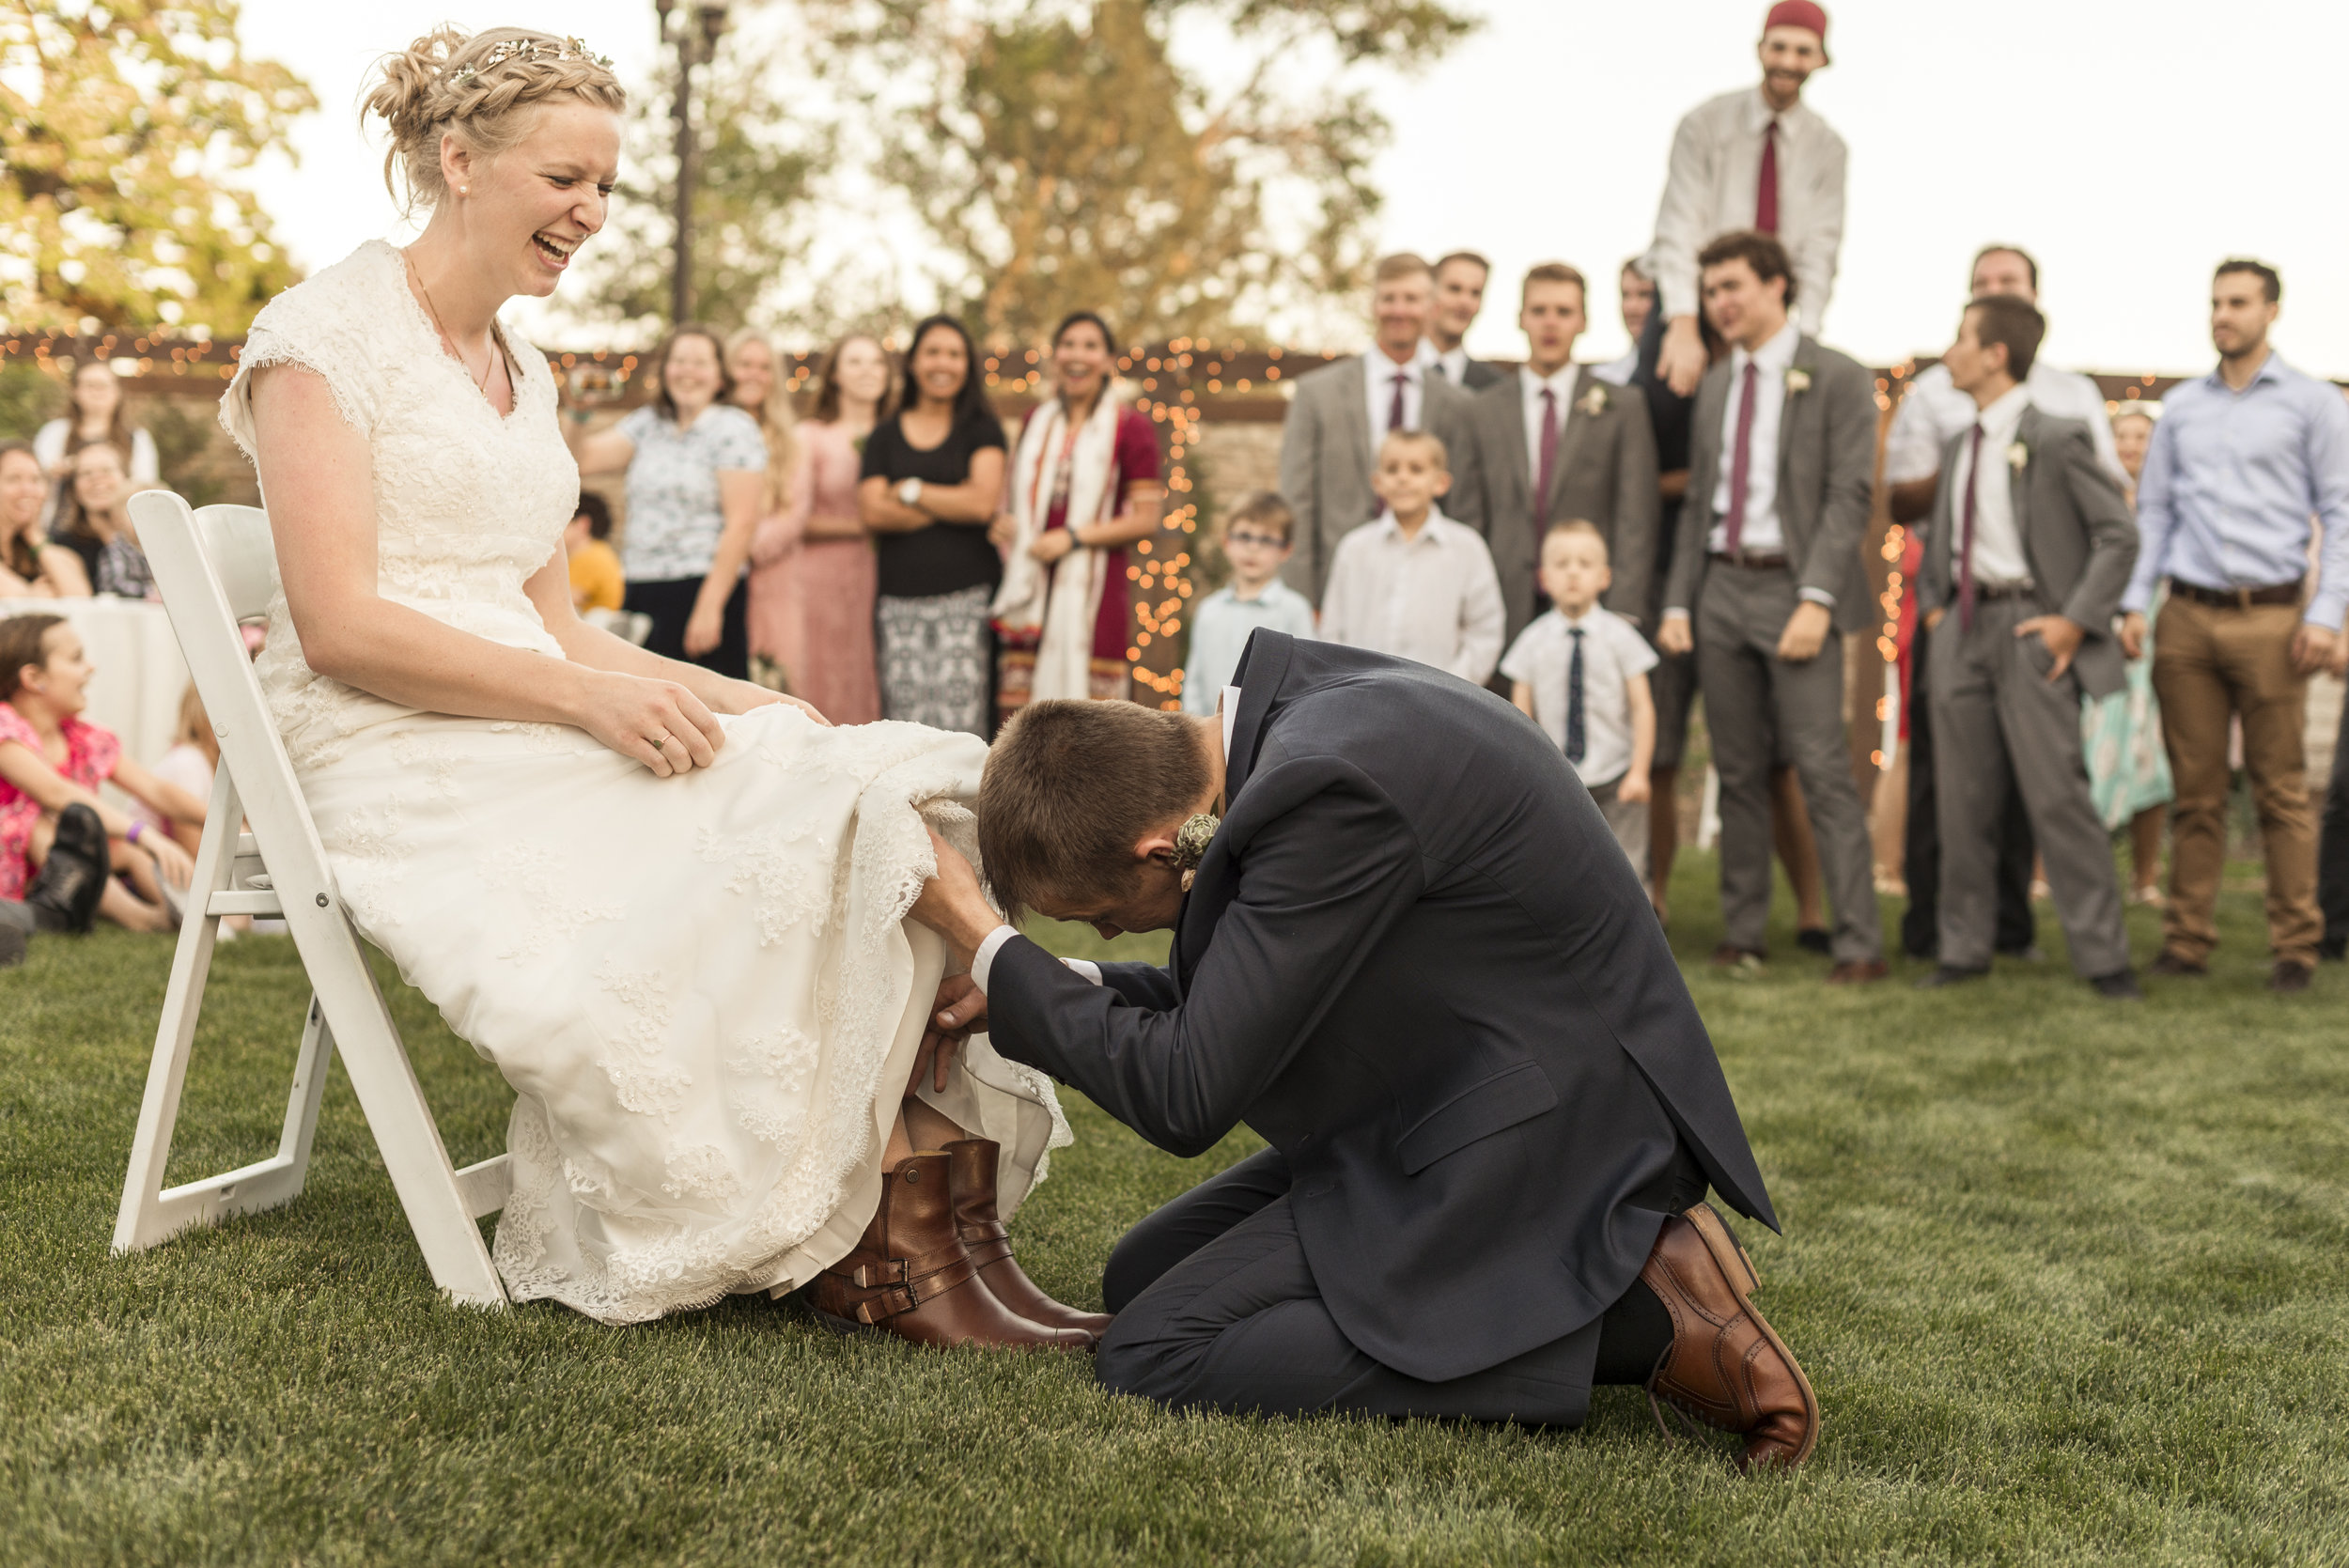 LDS Summer Wedding | South Jordan, Utah Wedding Photographer| Bri Bergman Photography 25.JPG